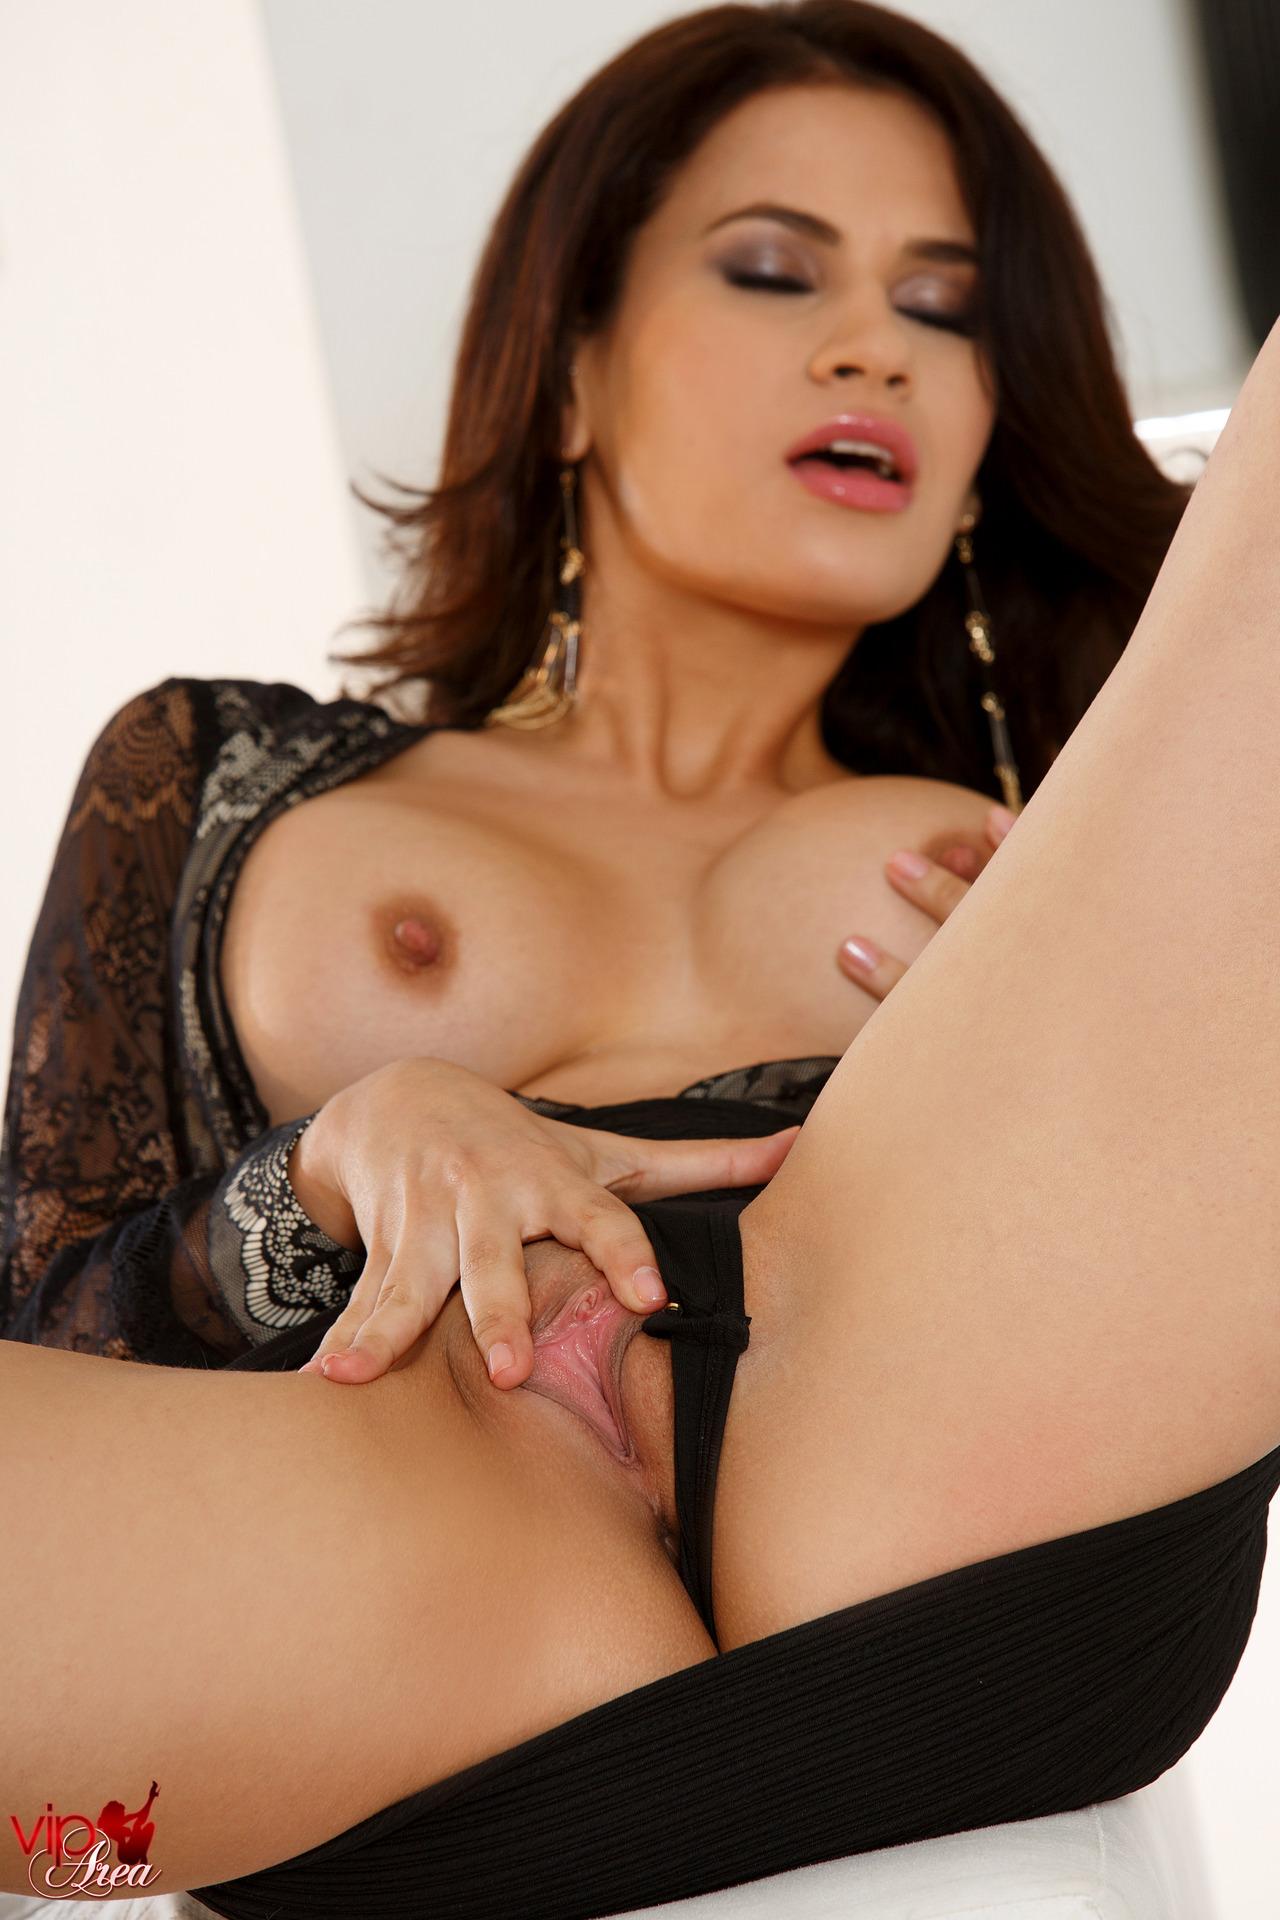 veliki pussys porno